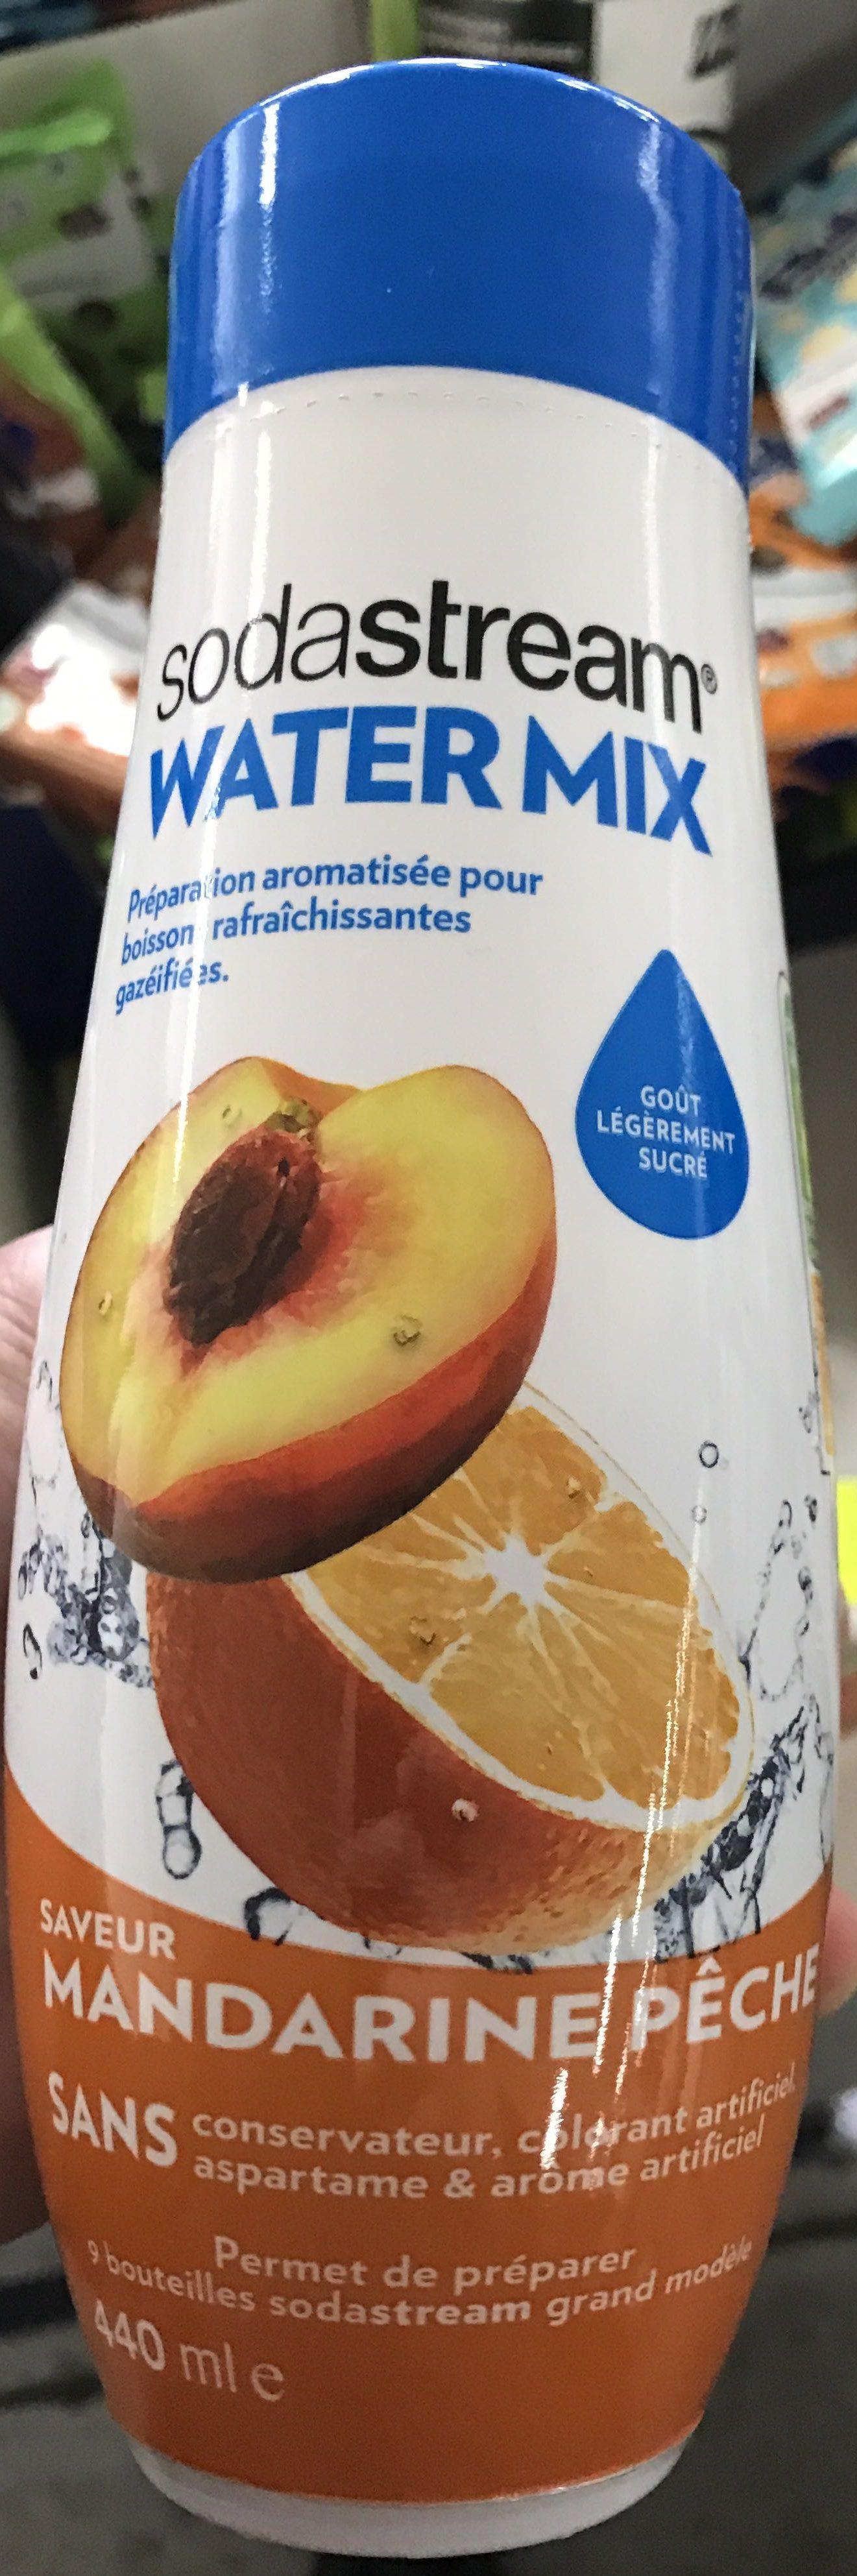 Water Mix saveur Mandarine Pêche - Produit - fr